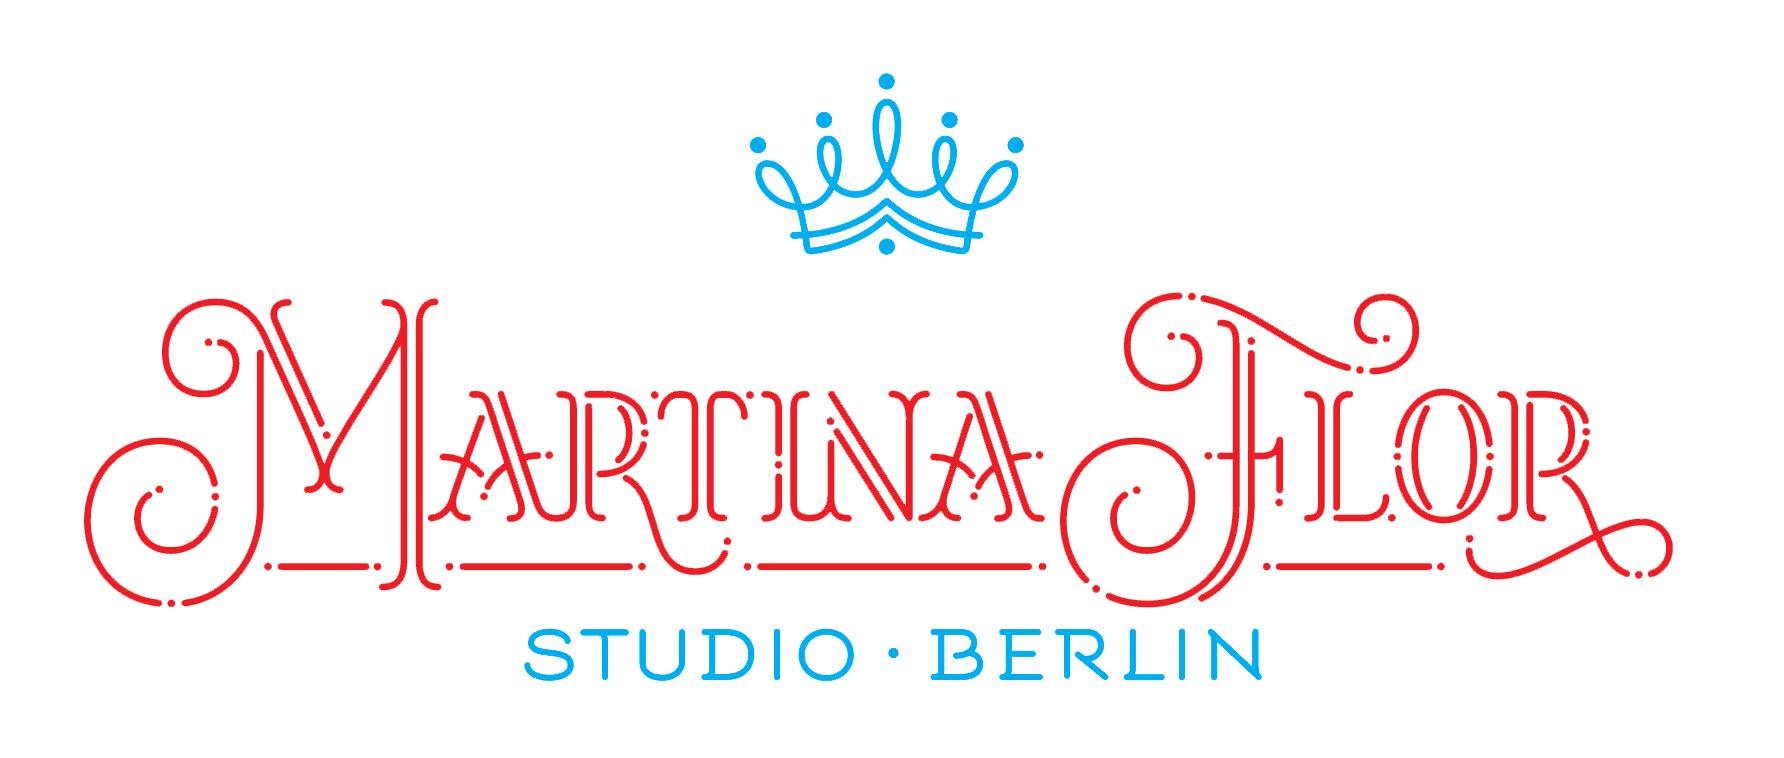 News — Page 2 of 17 — Studio Martina Flor